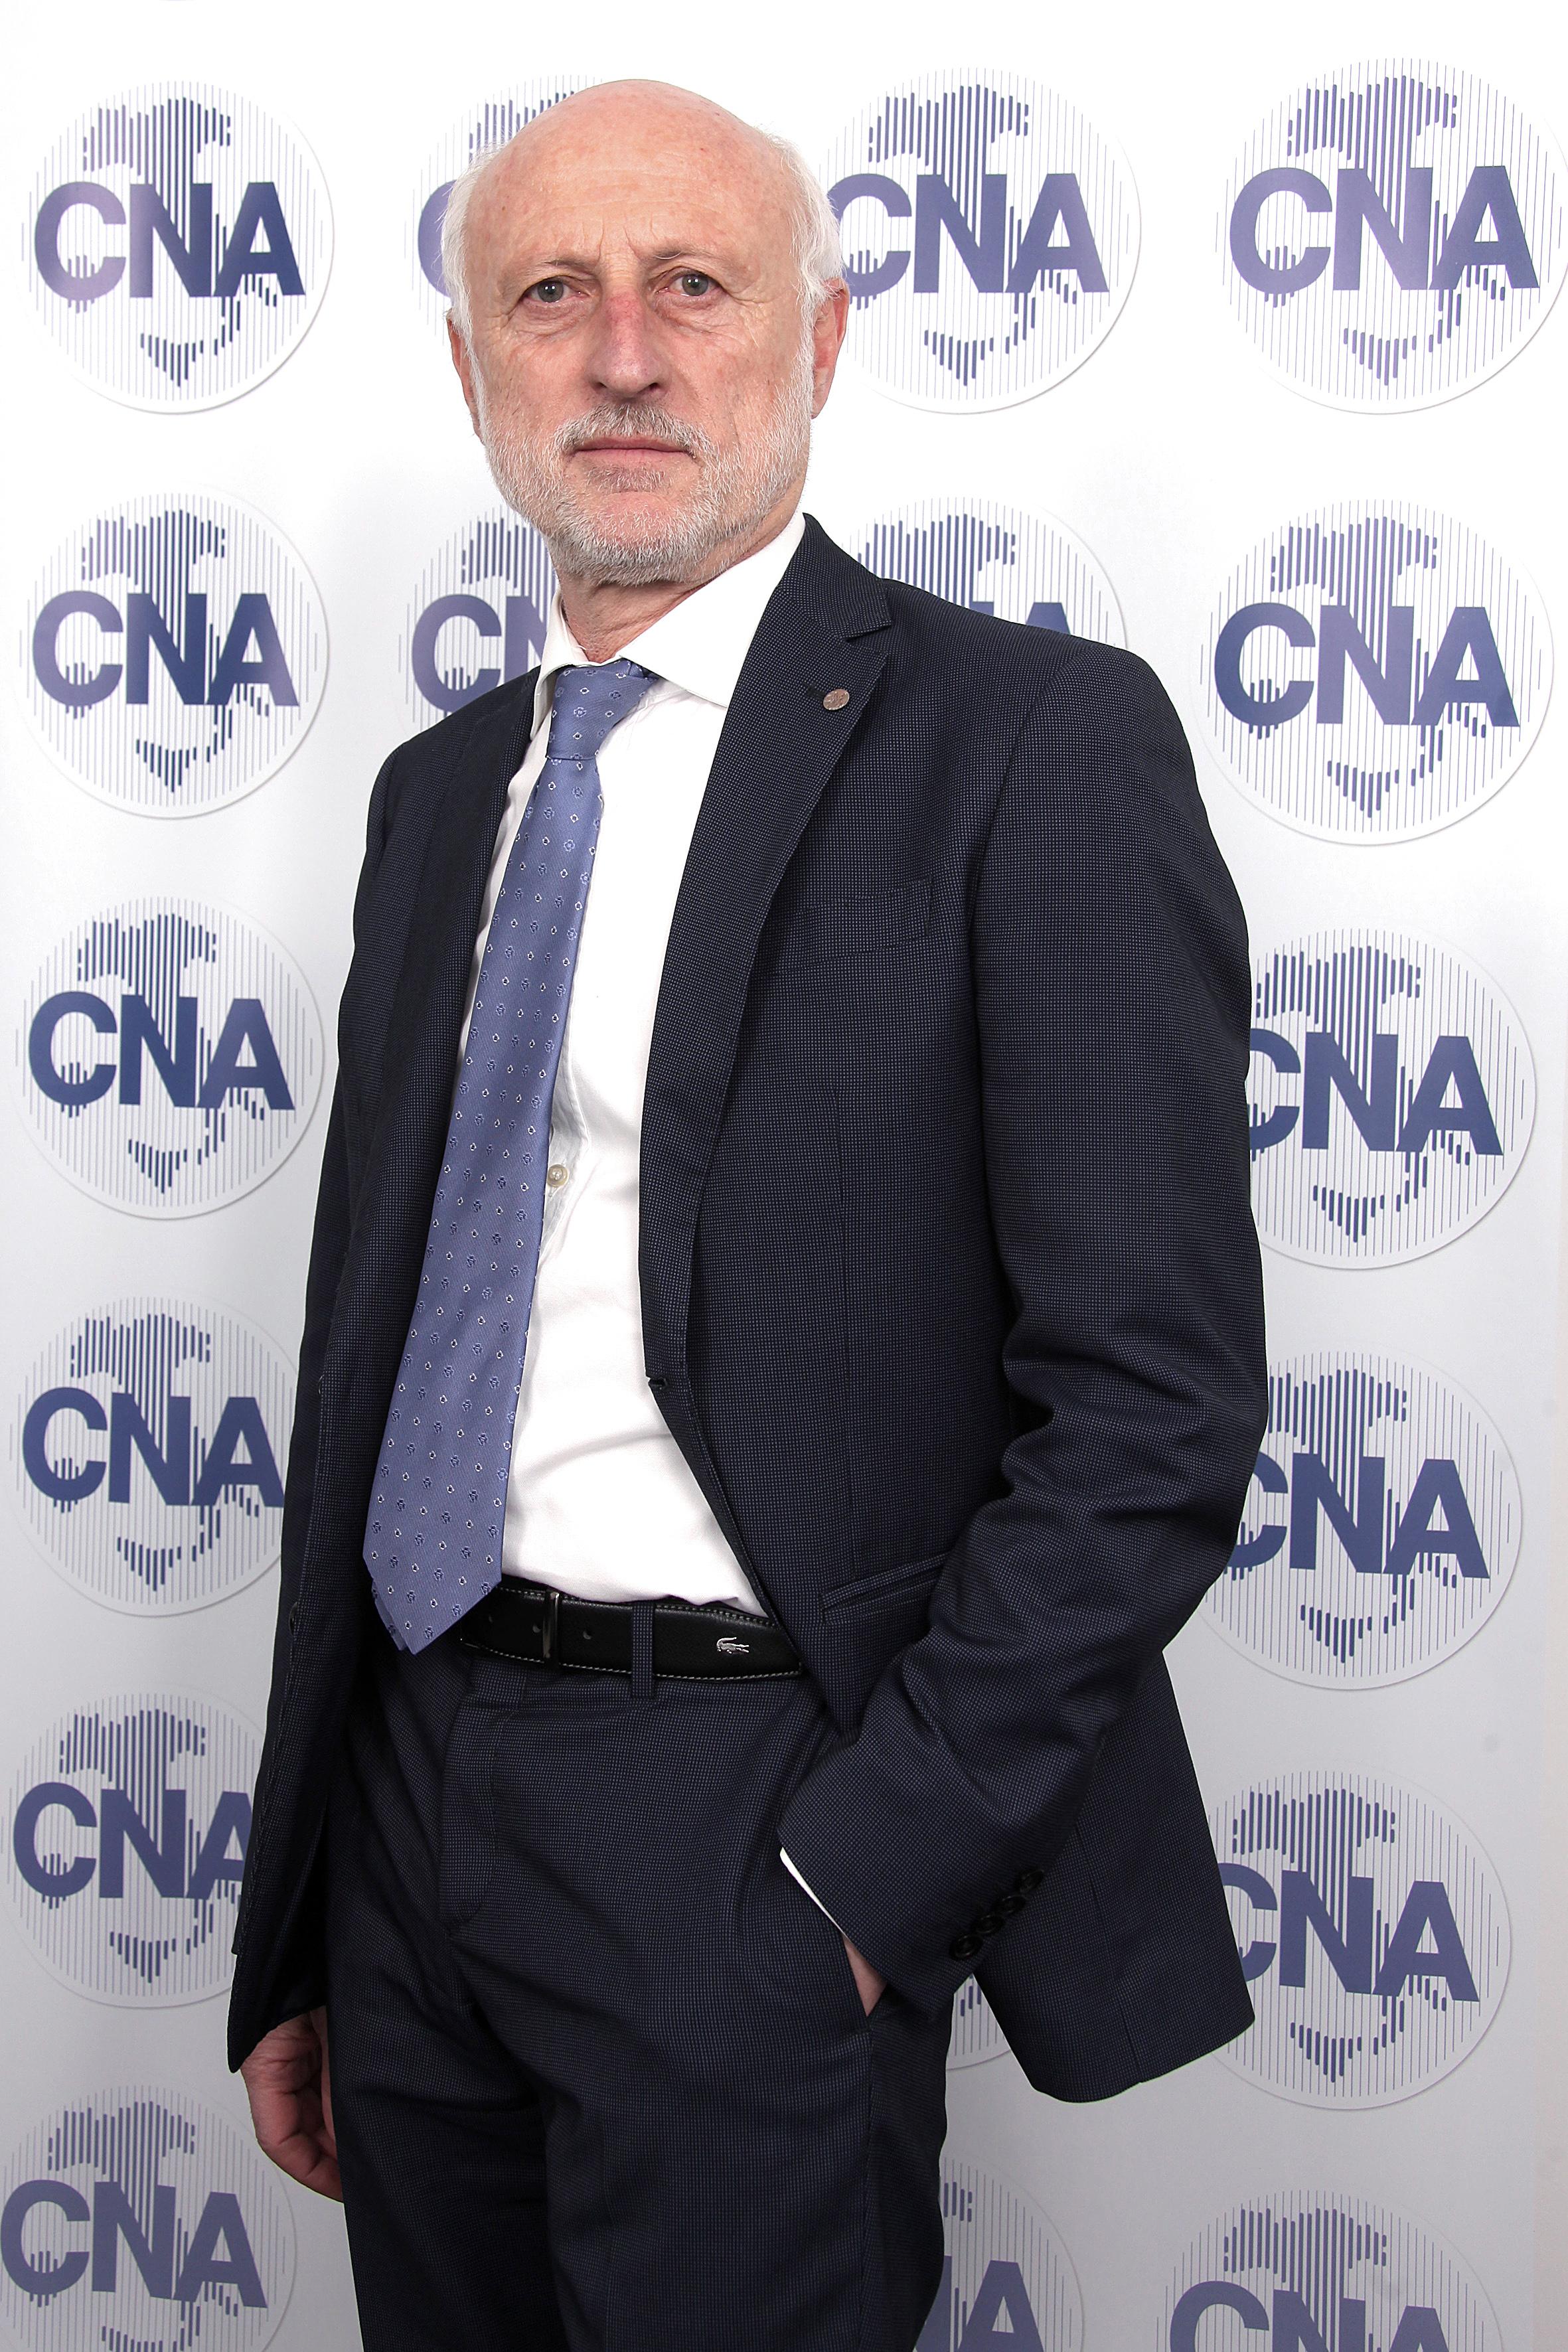 Daniele Vaccarino - Presiedente Nazionale CNA